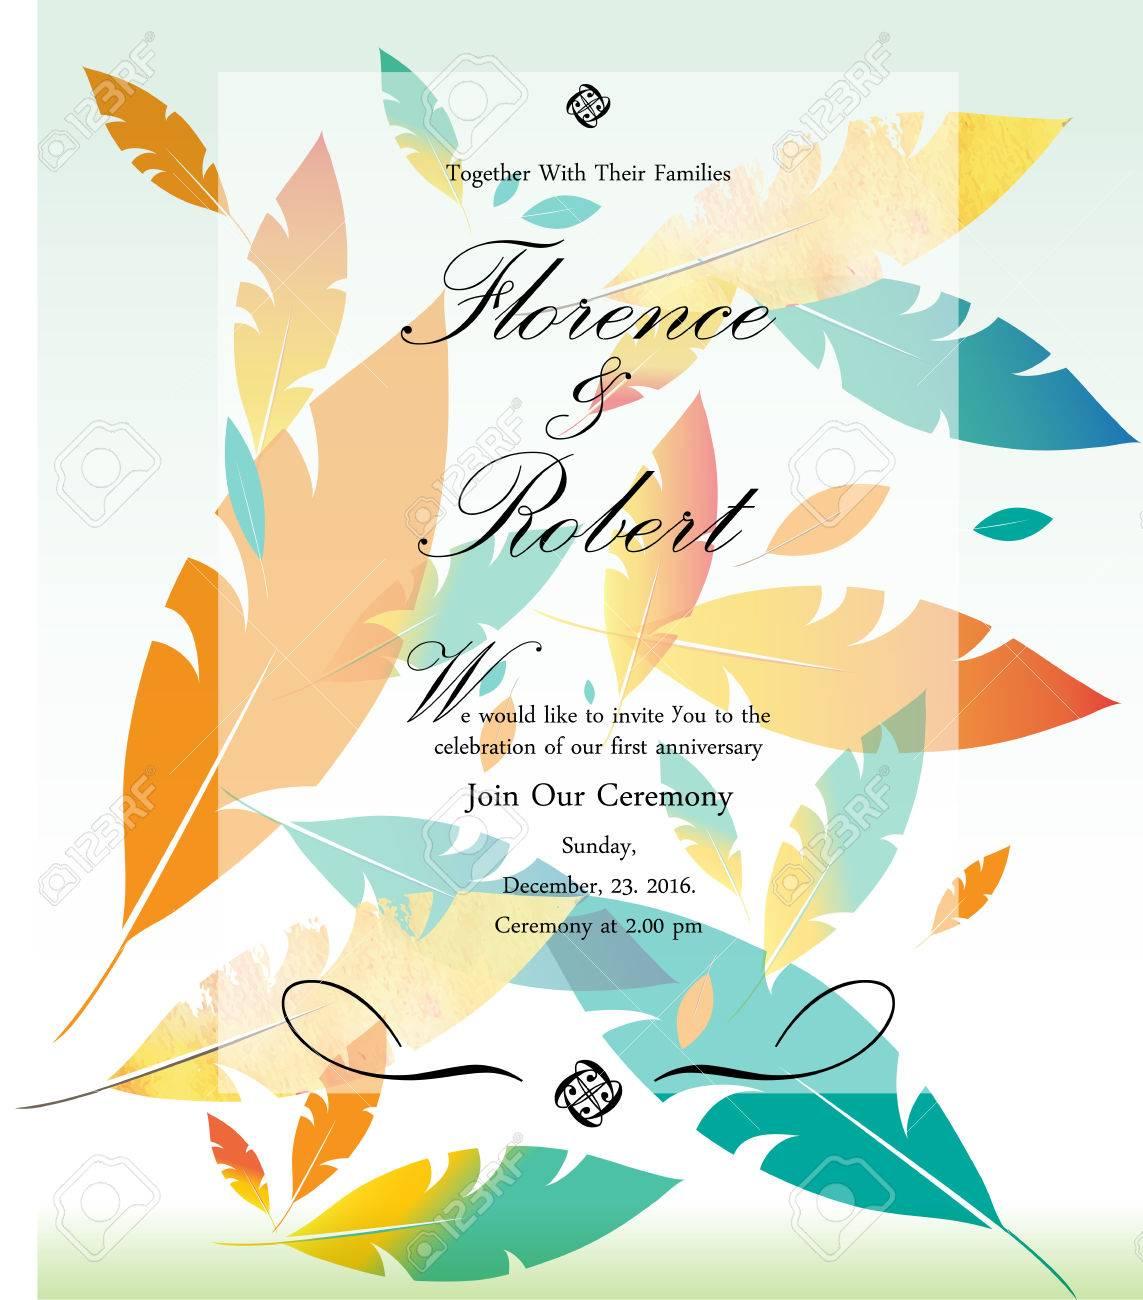 Colorful Wedding Invitation Vector Illustration, Creative Background ...